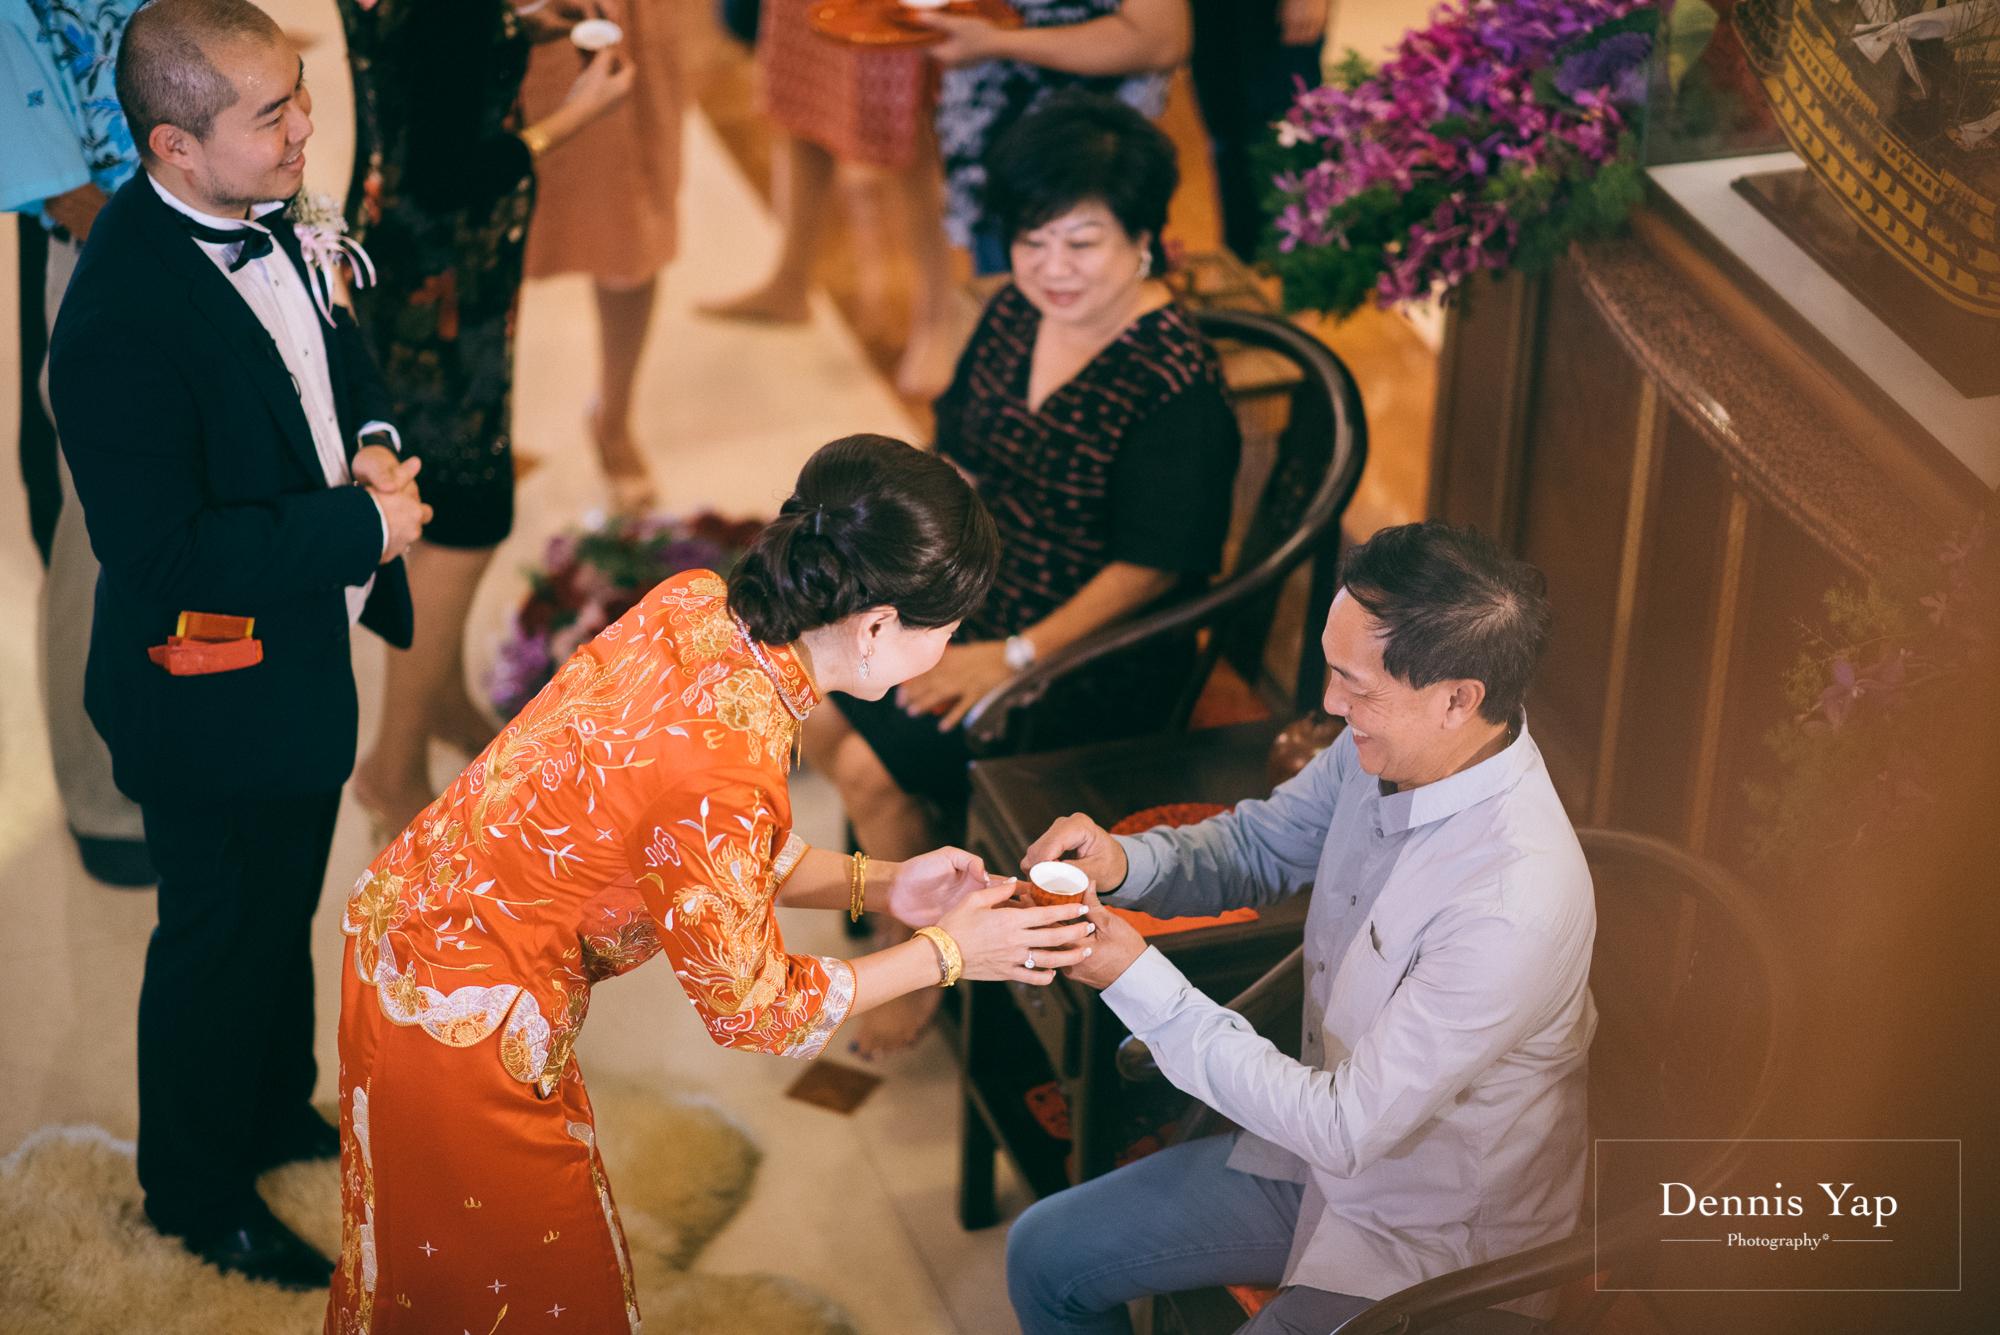 we chard sharon wedding day gate crash majestic hotel kuala lumpur moonlight dennis yap photography malaysia-36.jpg